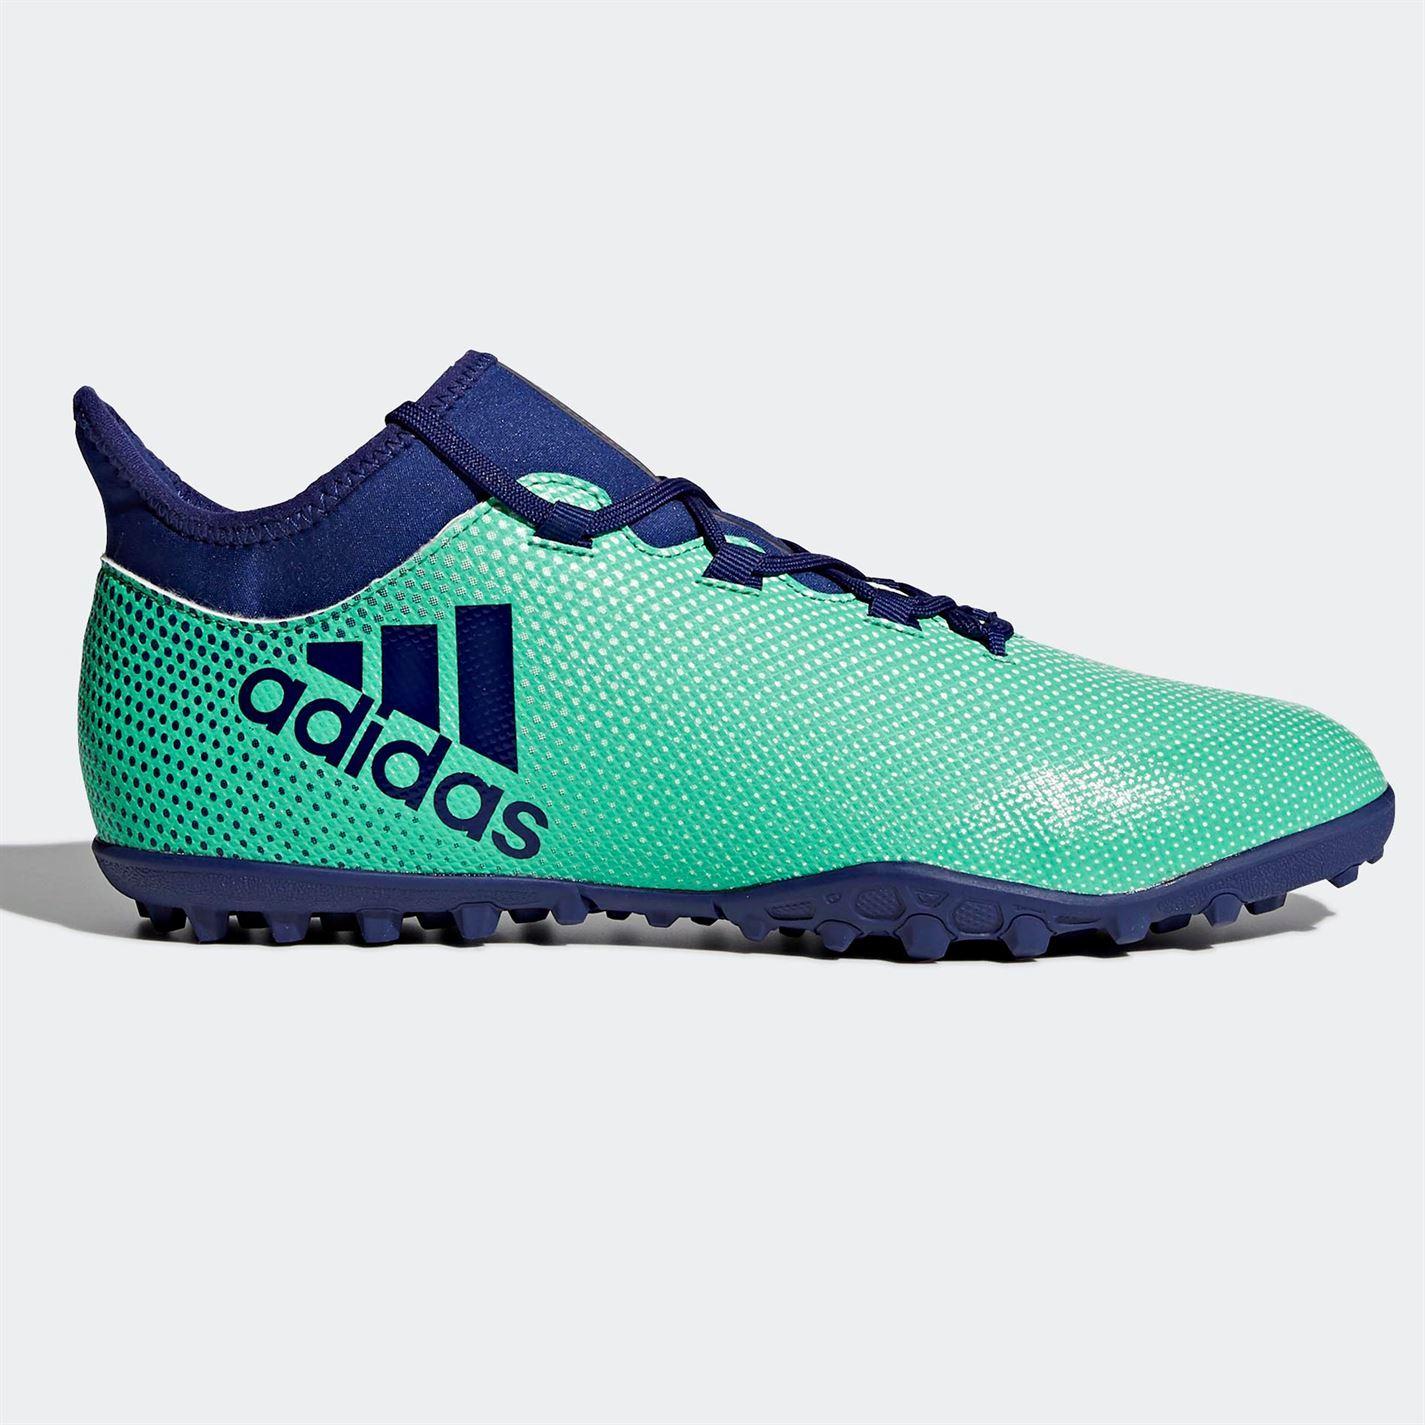 adidas x 17.3 mens astro turf trainers